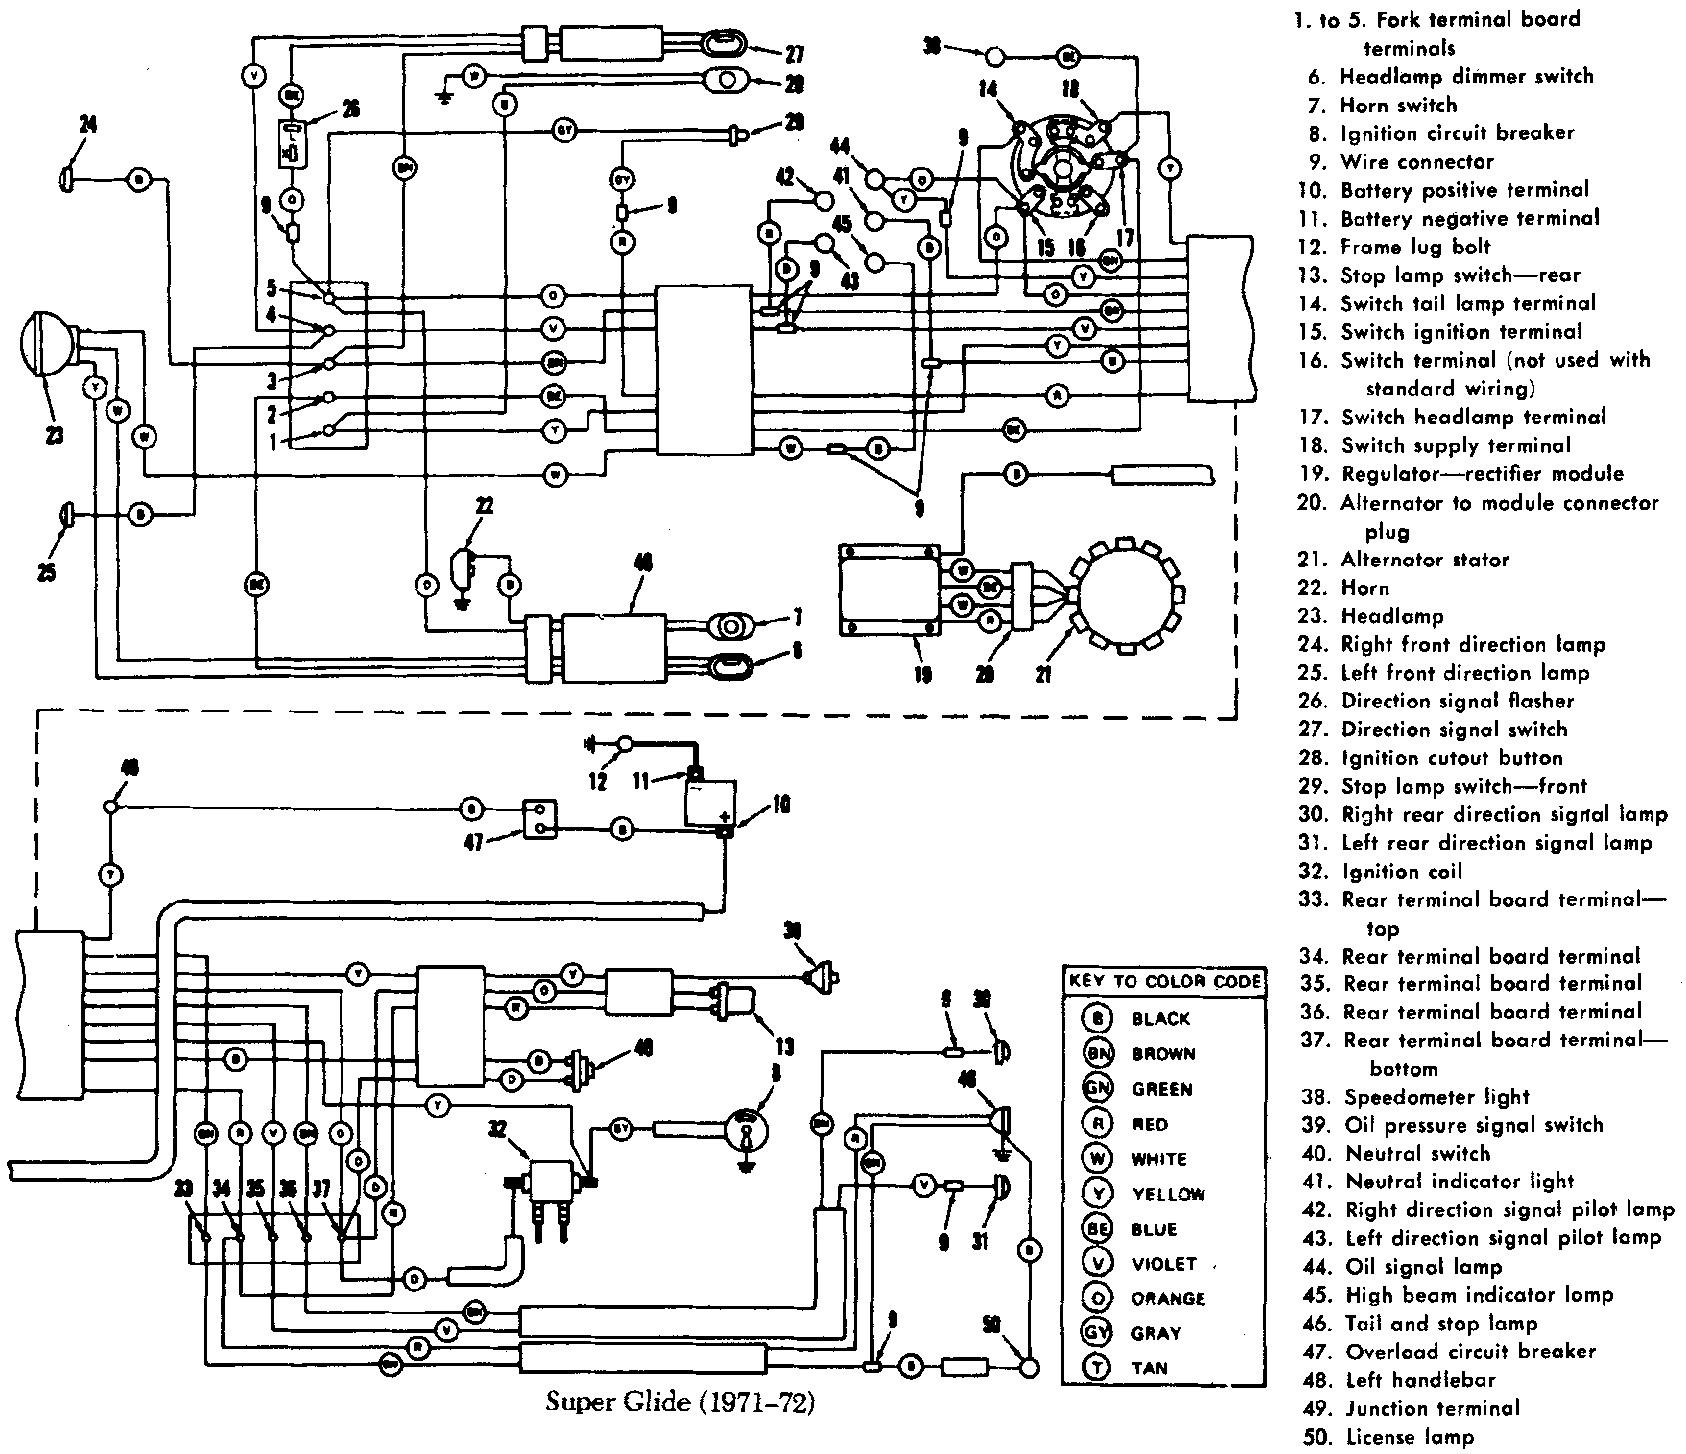 harley golf cart wiring diagram for 79 wiring diagram paperHarley Golf Cart Wiring Diagram For 79 #1